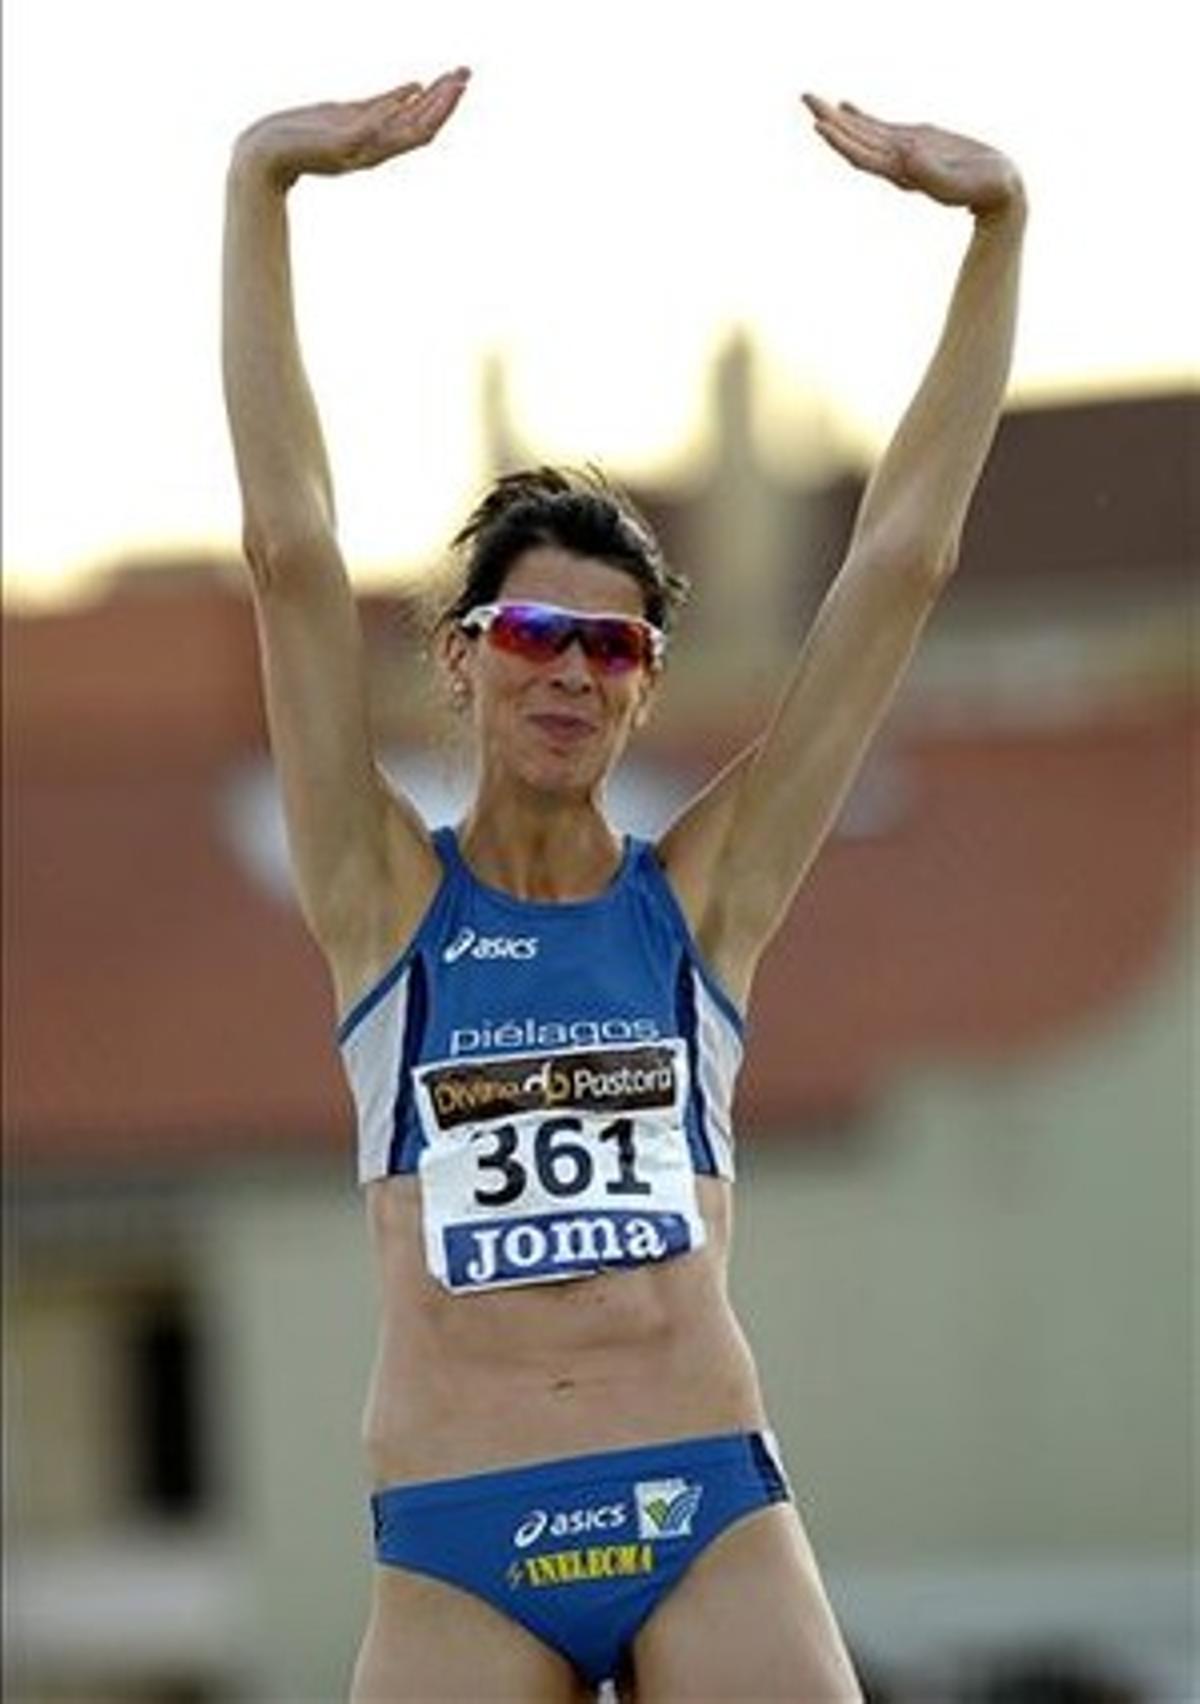 Beitia, este domingo en Pmplona, donde ha vuelto a coronarse campeona de España antes de decir adiós.